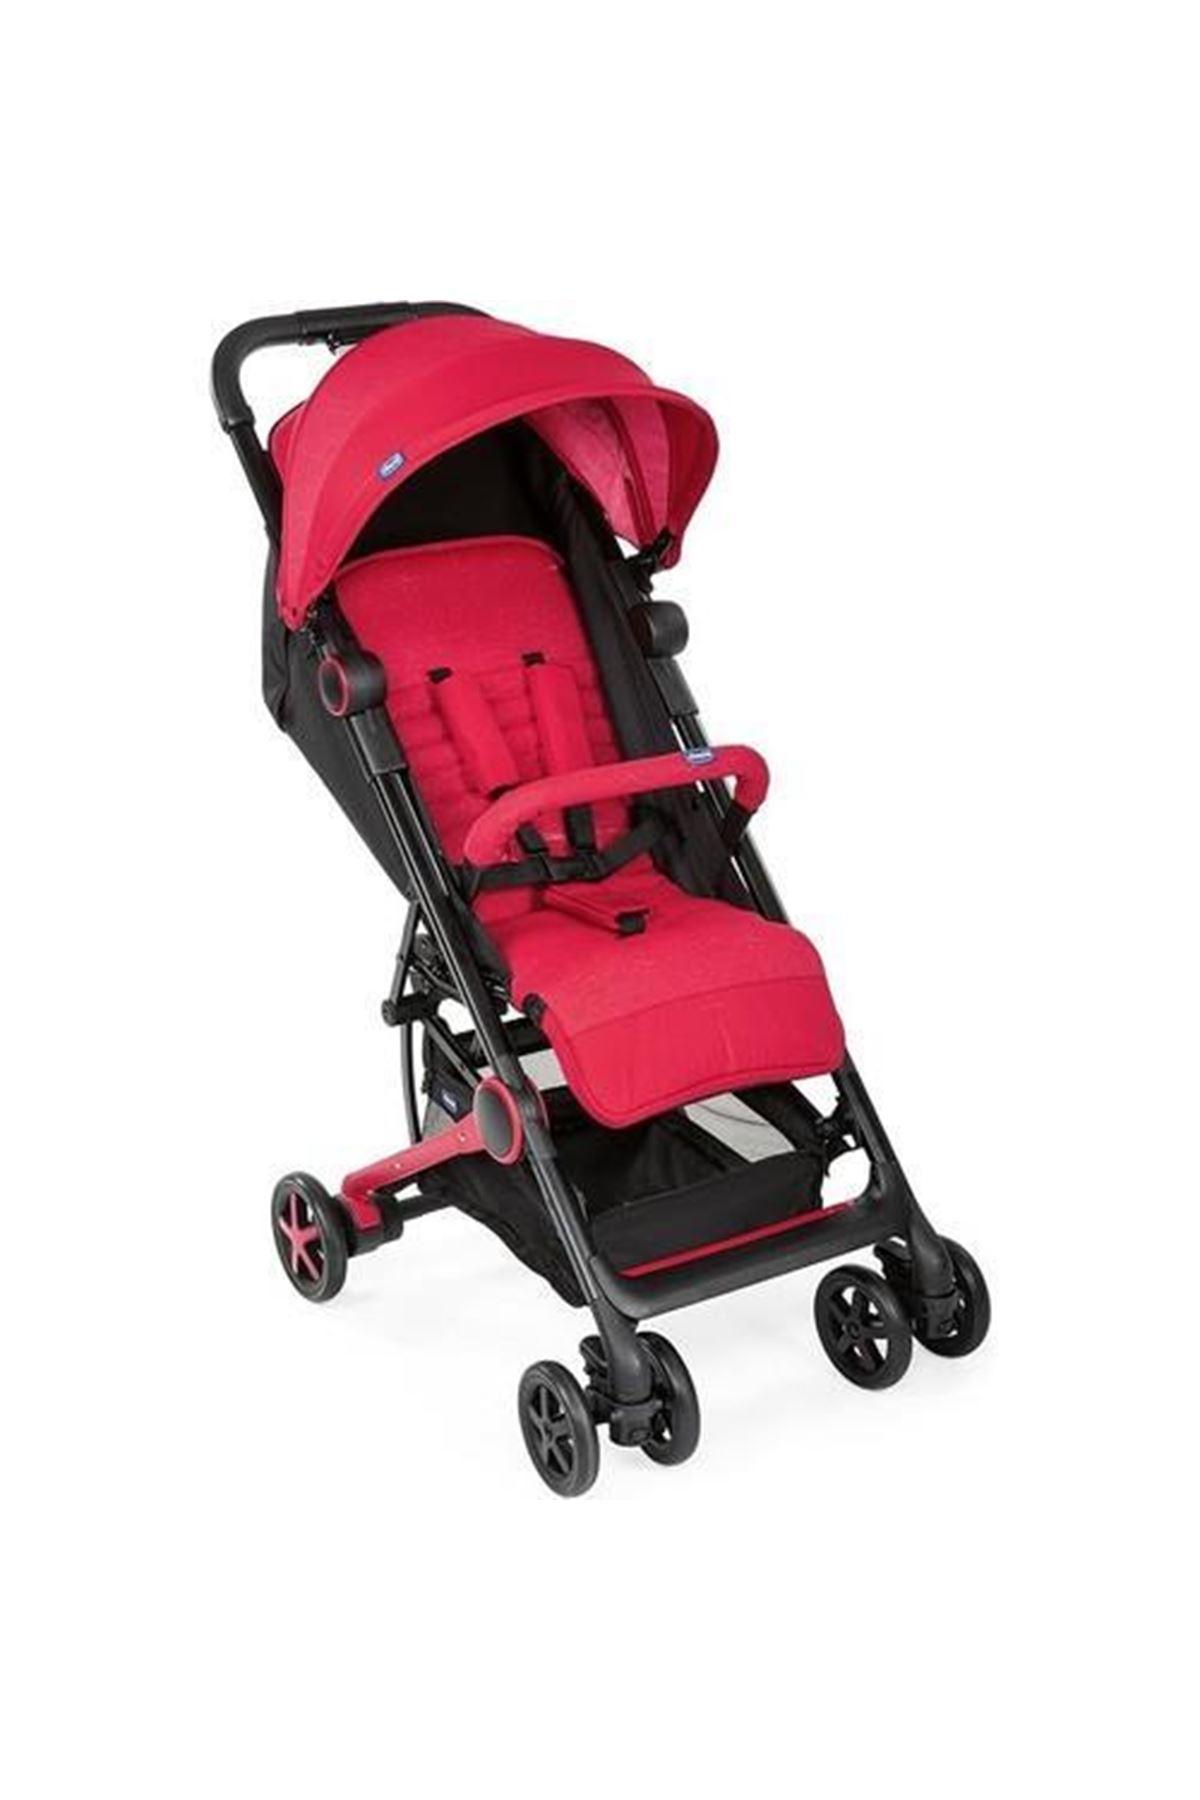 Chicco Miinimo3 Ultra Kompakt Bebek Arabası Red Passion